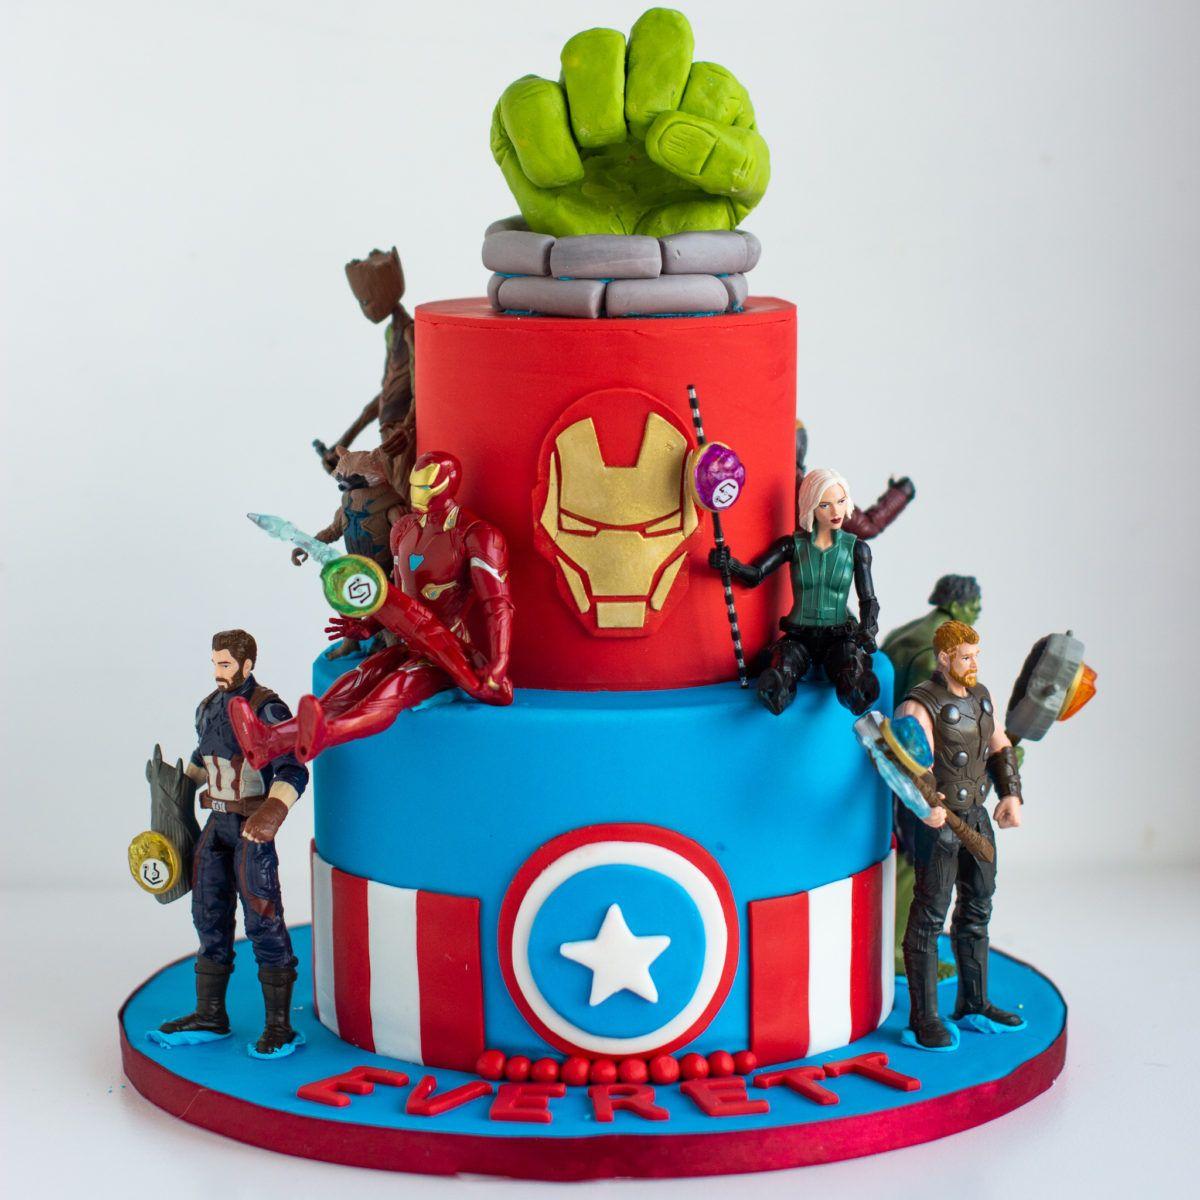 America Cake Decorating Supplies Avengers Birthday Cakes Marvel Birthday Cake America Cake